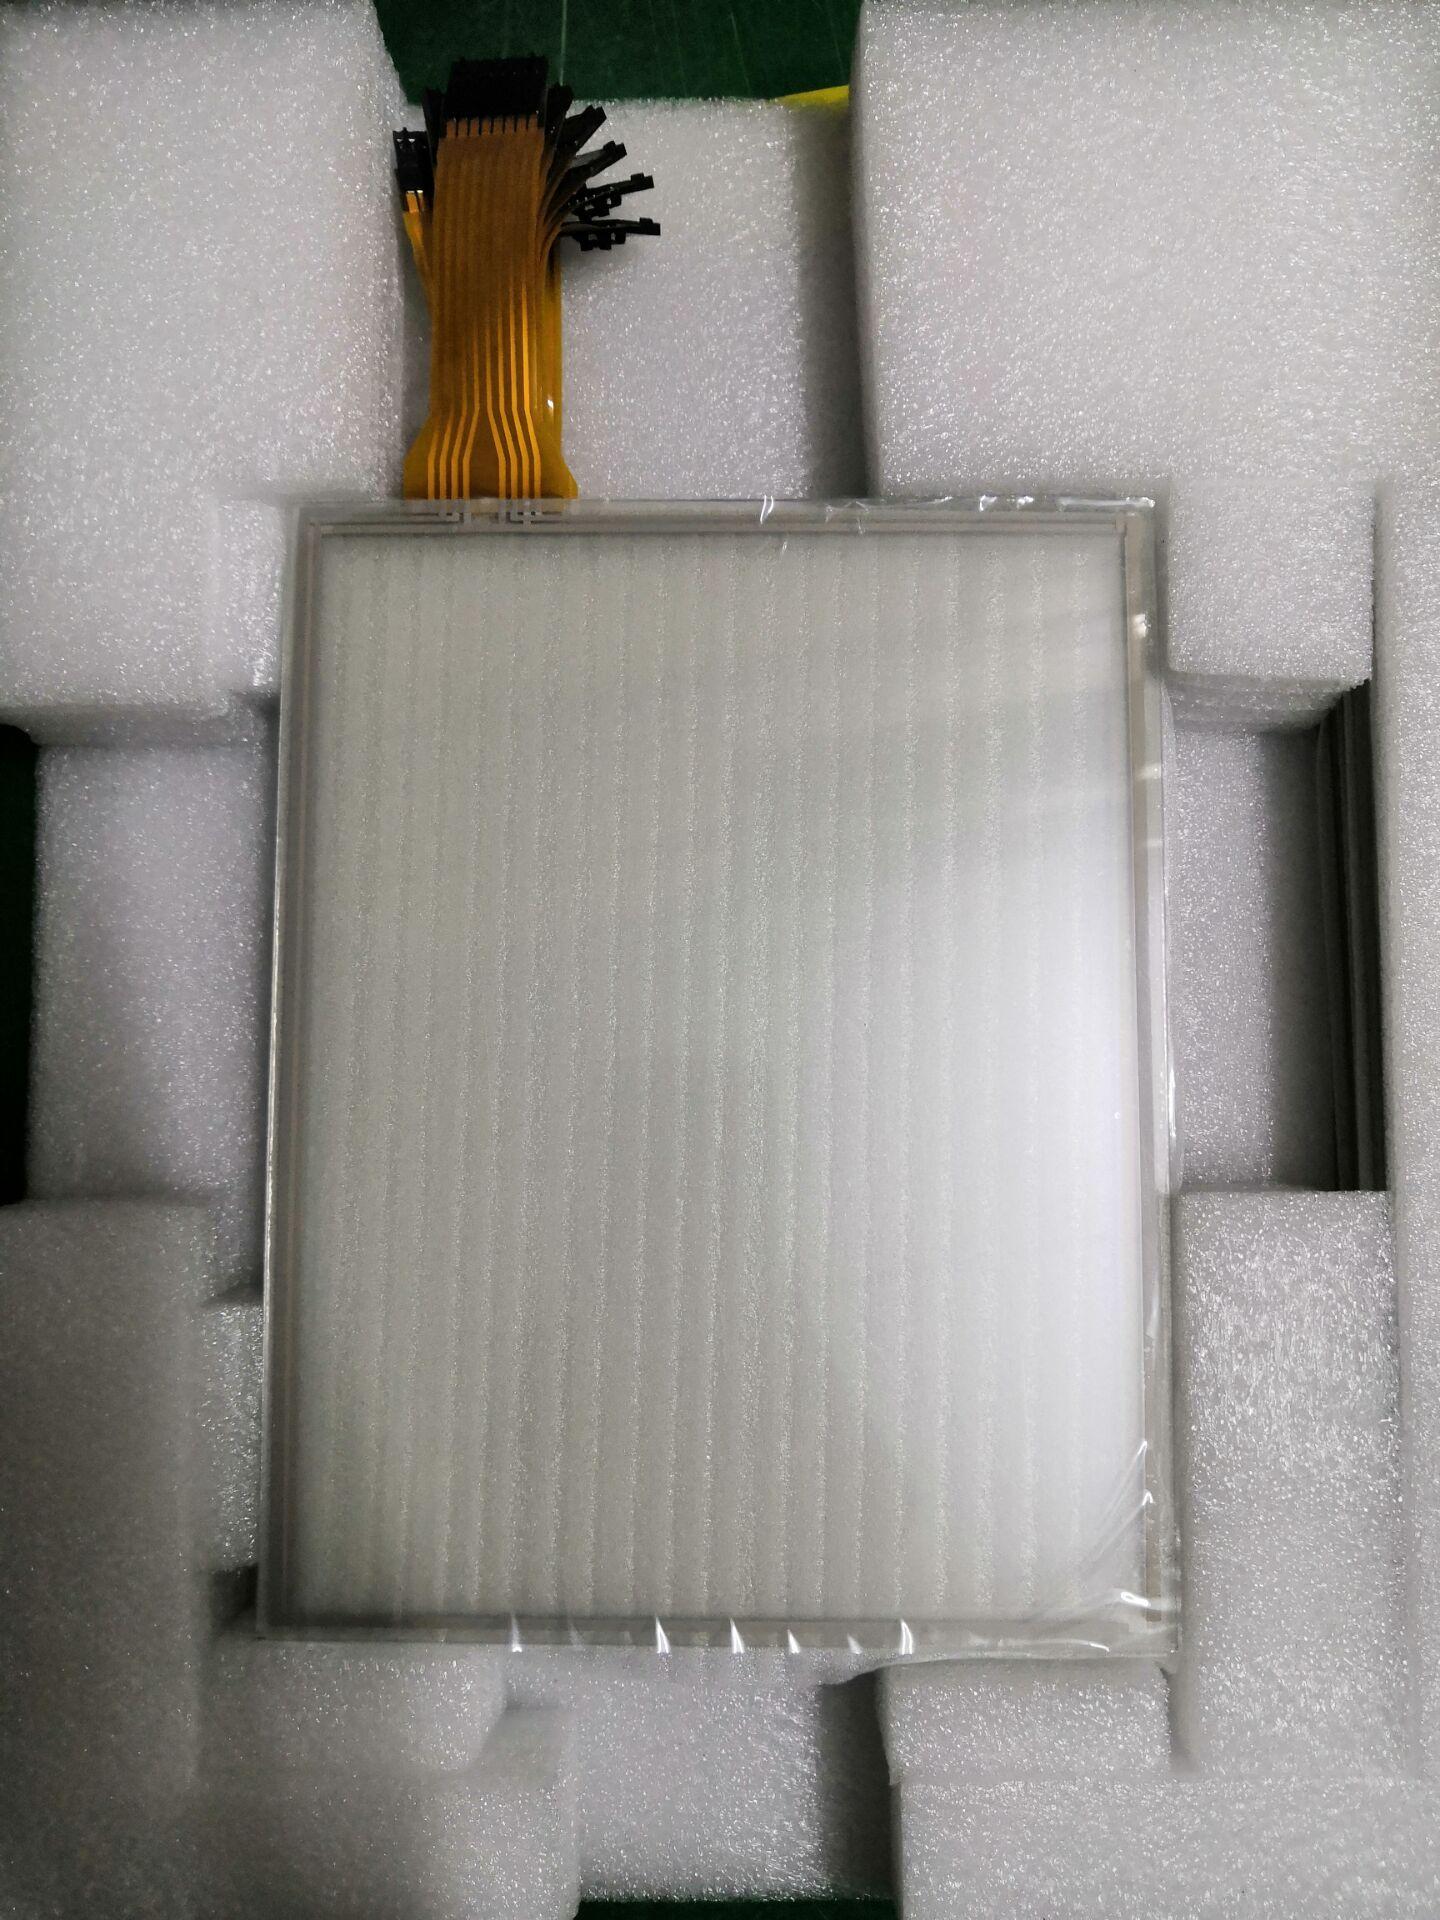 Panel de pantalla táctil resistivo de 8 cables de 10,4 pulgadas OBR8103A1